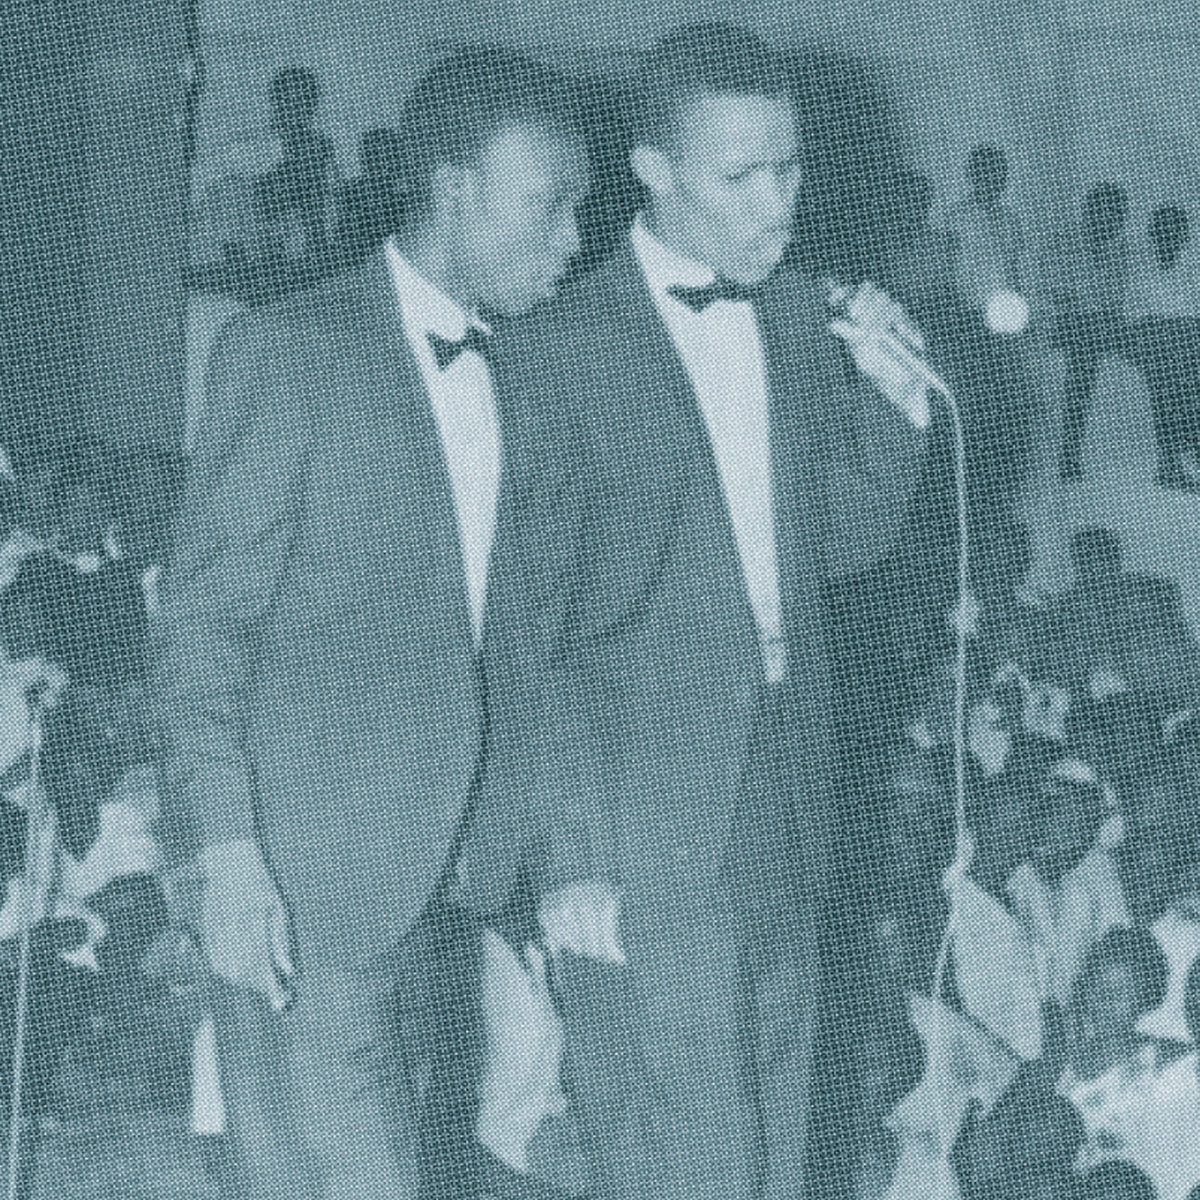 If I Had a Pair of Wings: Jamaican Doo Wop, Vol. 1